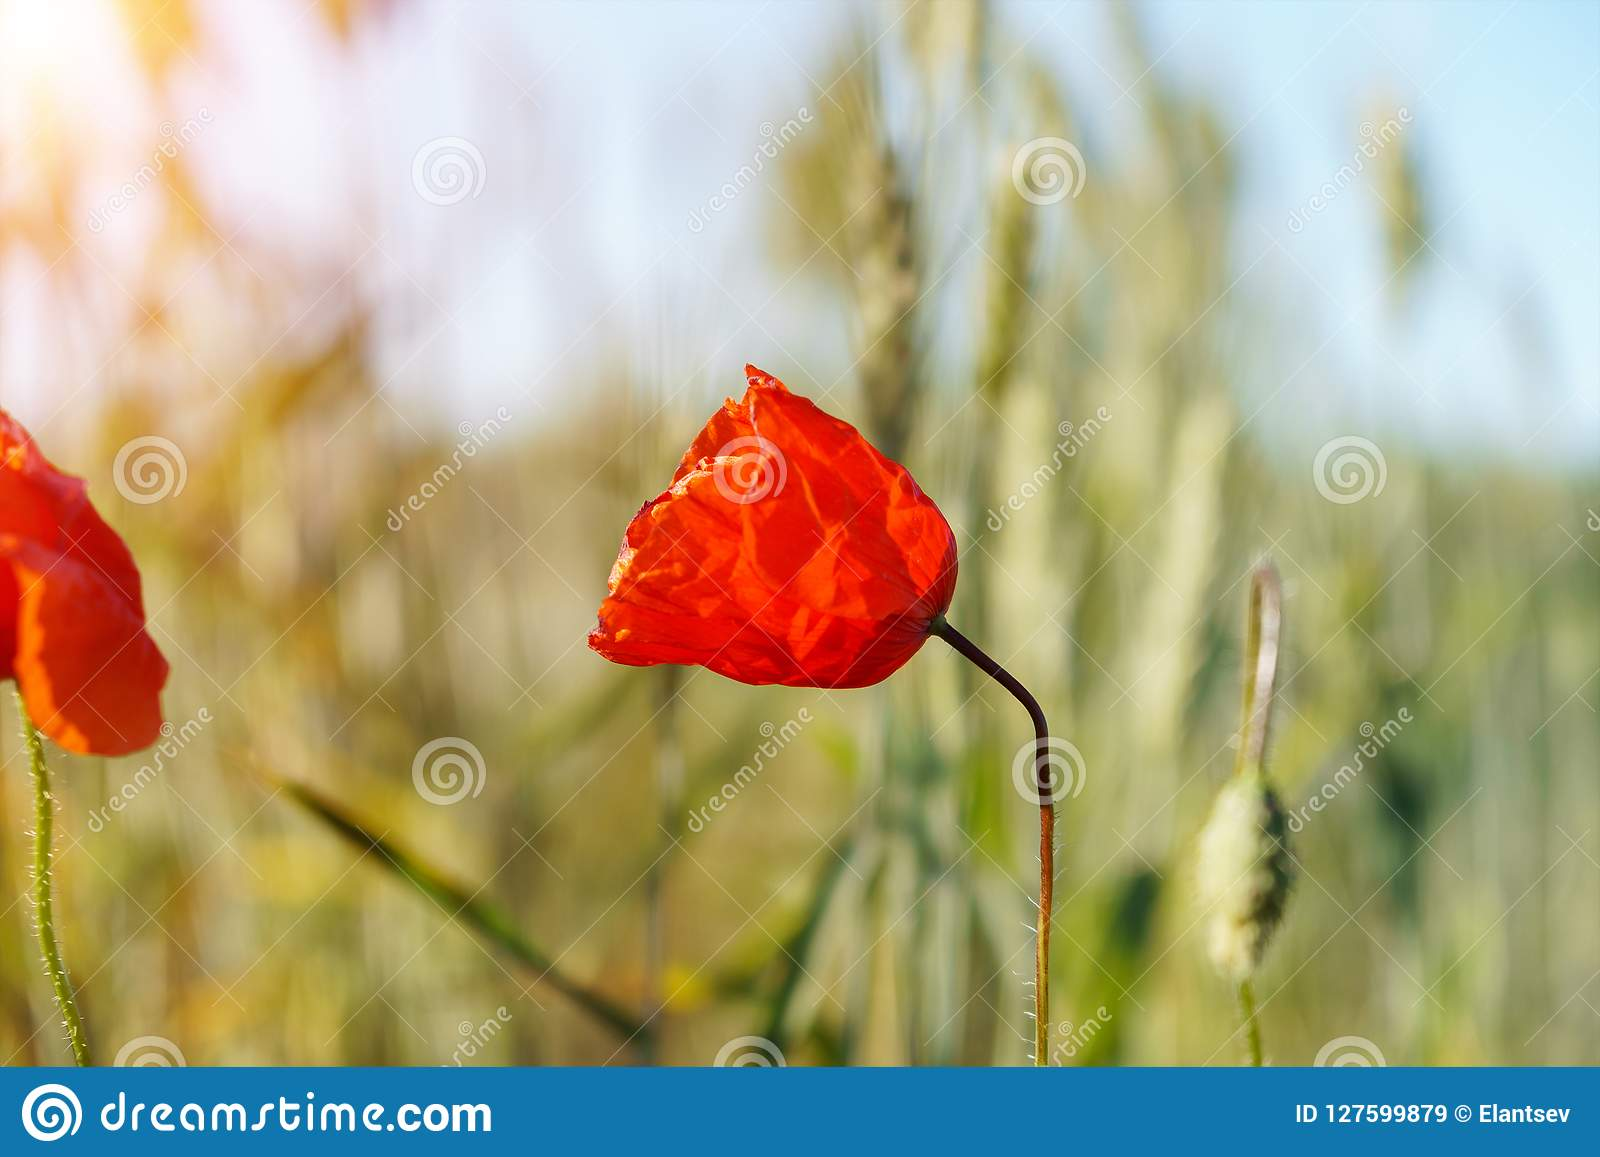 Poppy Flowers Field  Rural Landscape With Red Wildflowers